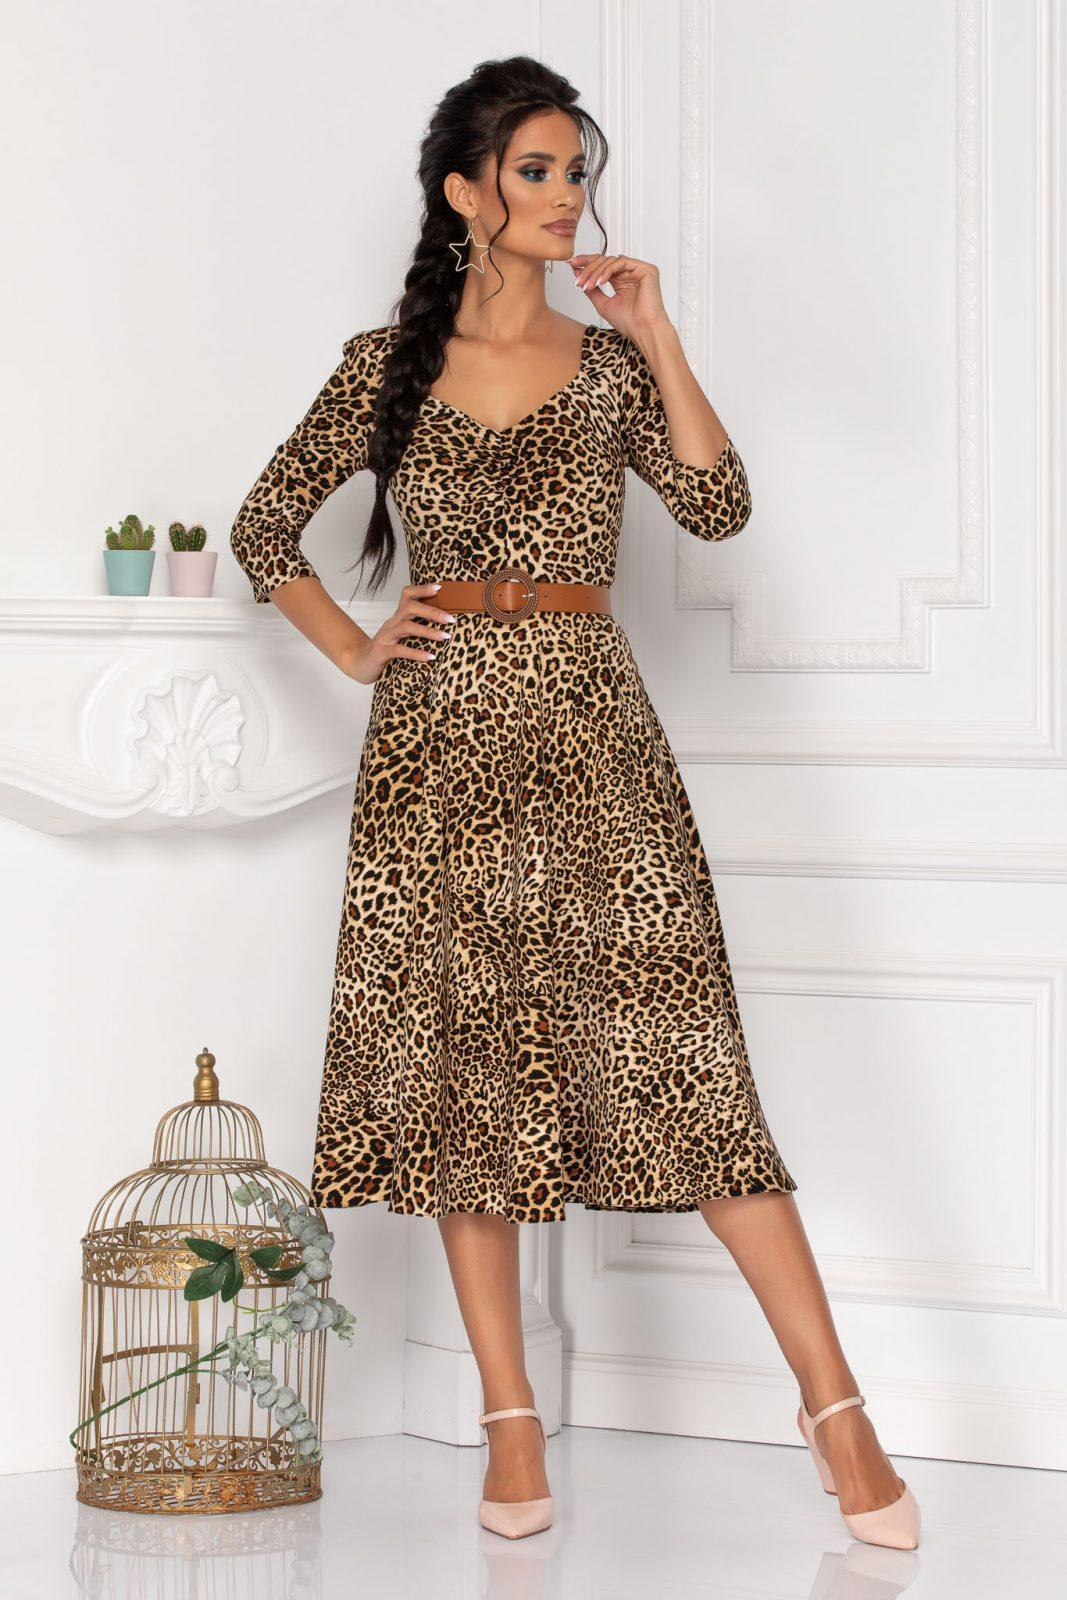 Hariett Caramel Dress